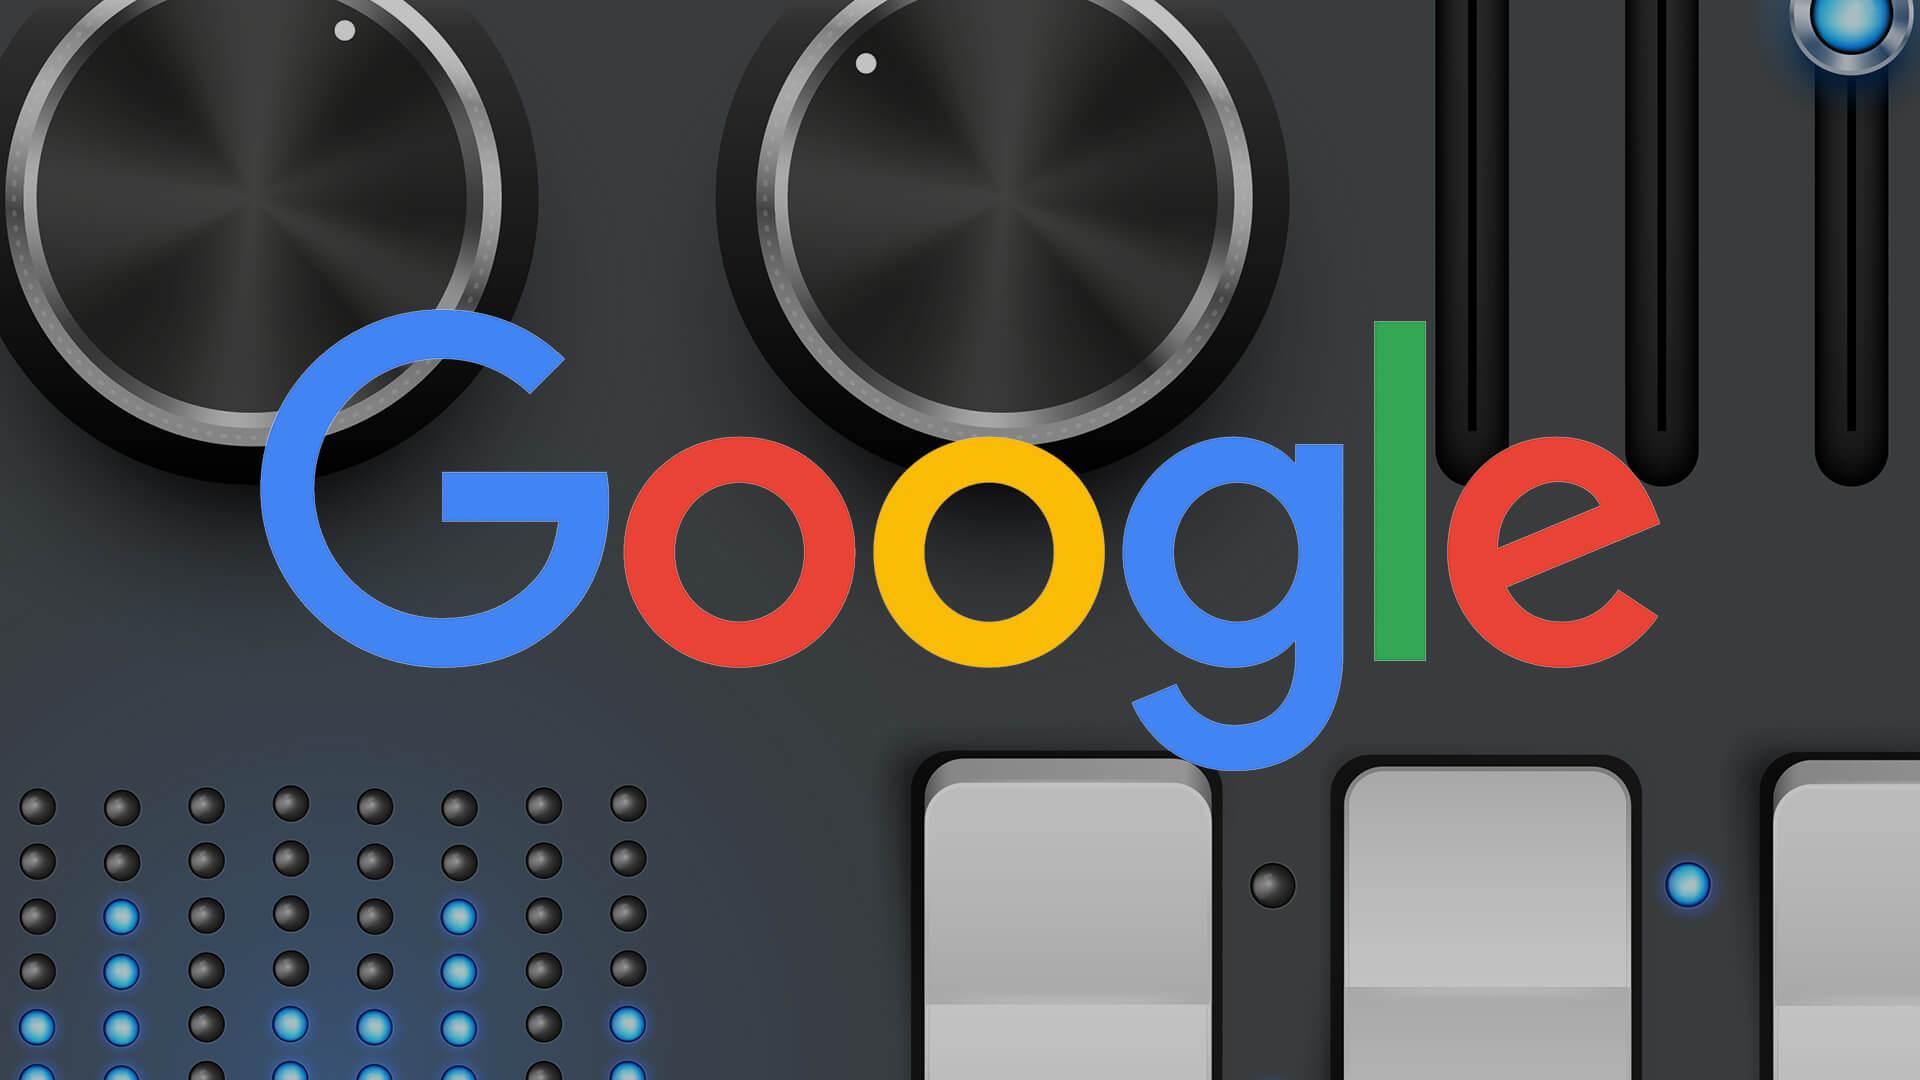 Google Beta Testing Brand-new Google Search Console Design